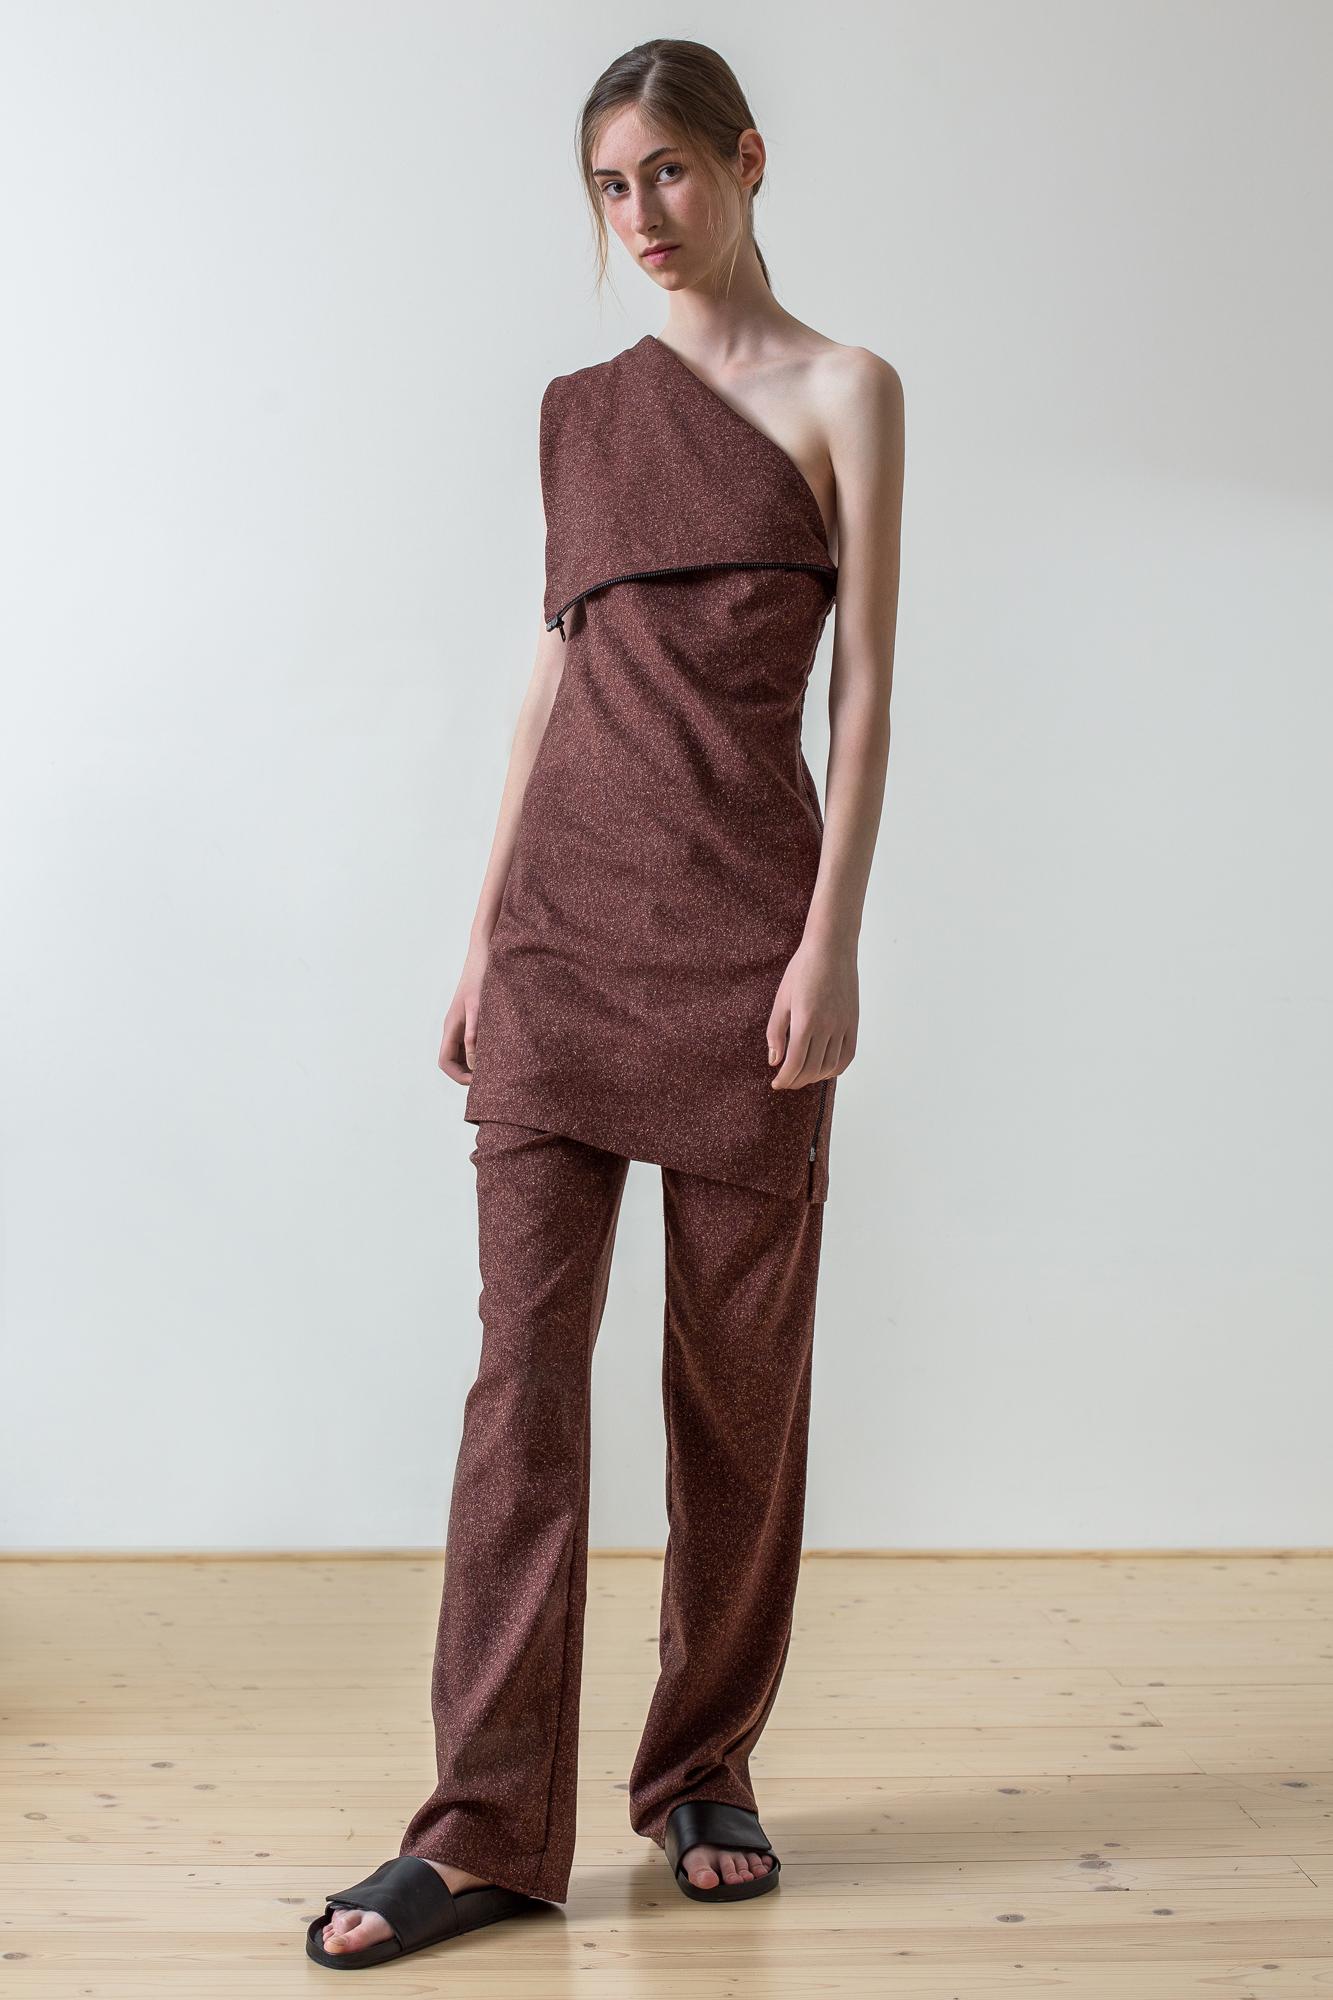 wearenotsisters_wrns_echo-dress_01